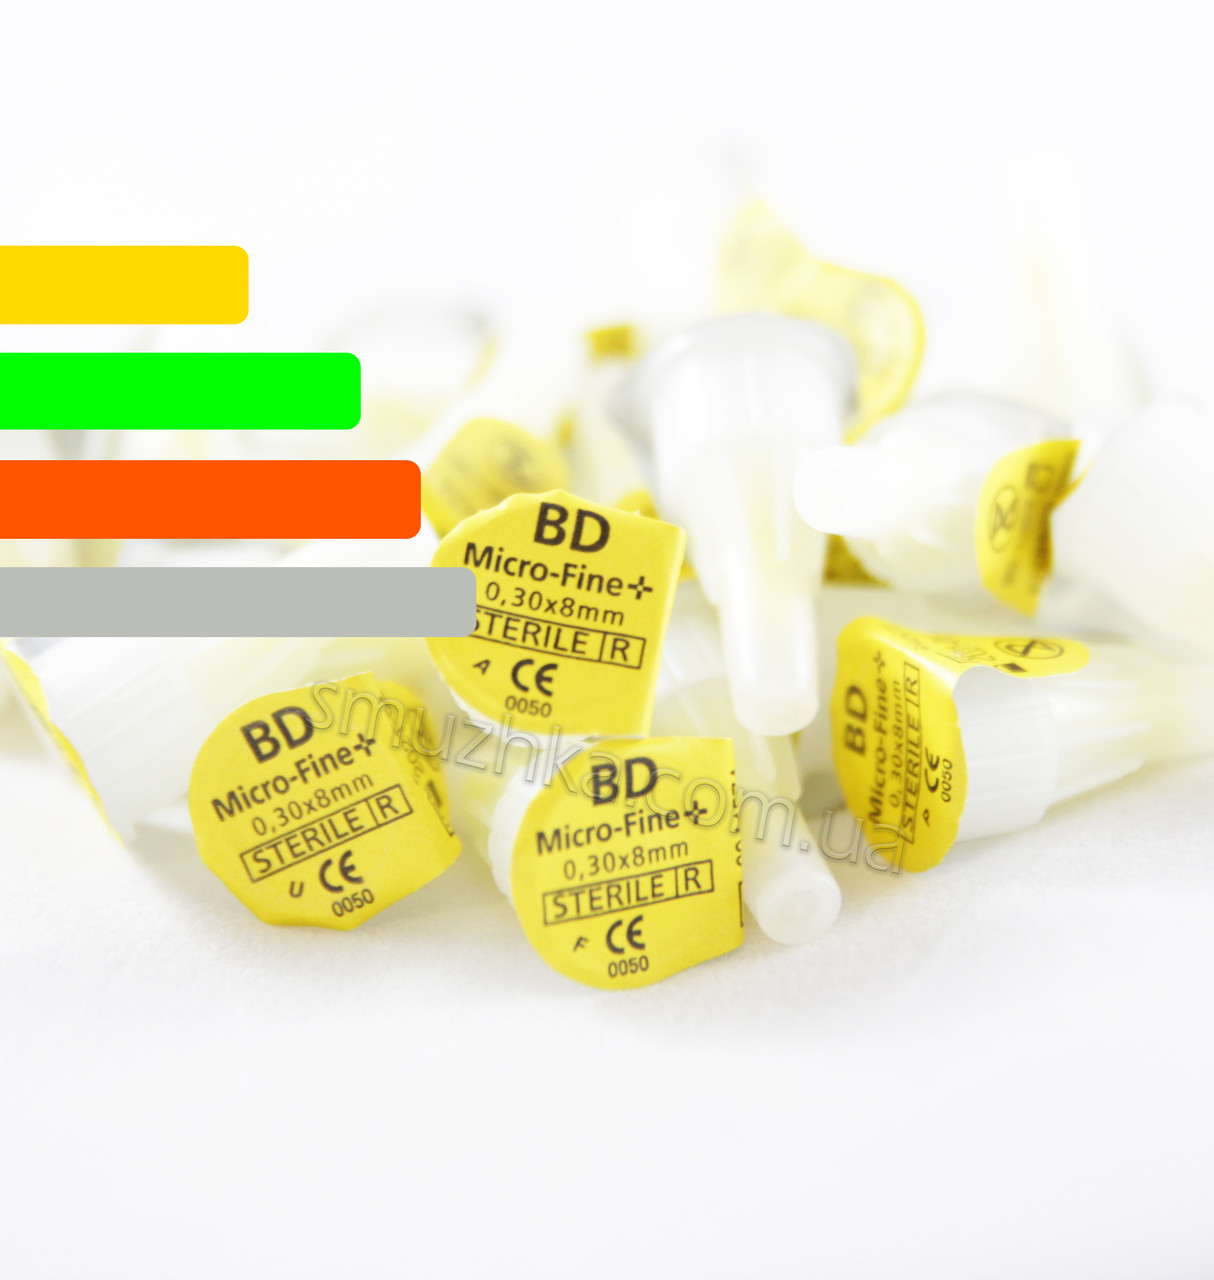 Иглы для шприц-ручек BD Micro-Fine Plus 8 мм, 30G - Поштучно Микрофайн